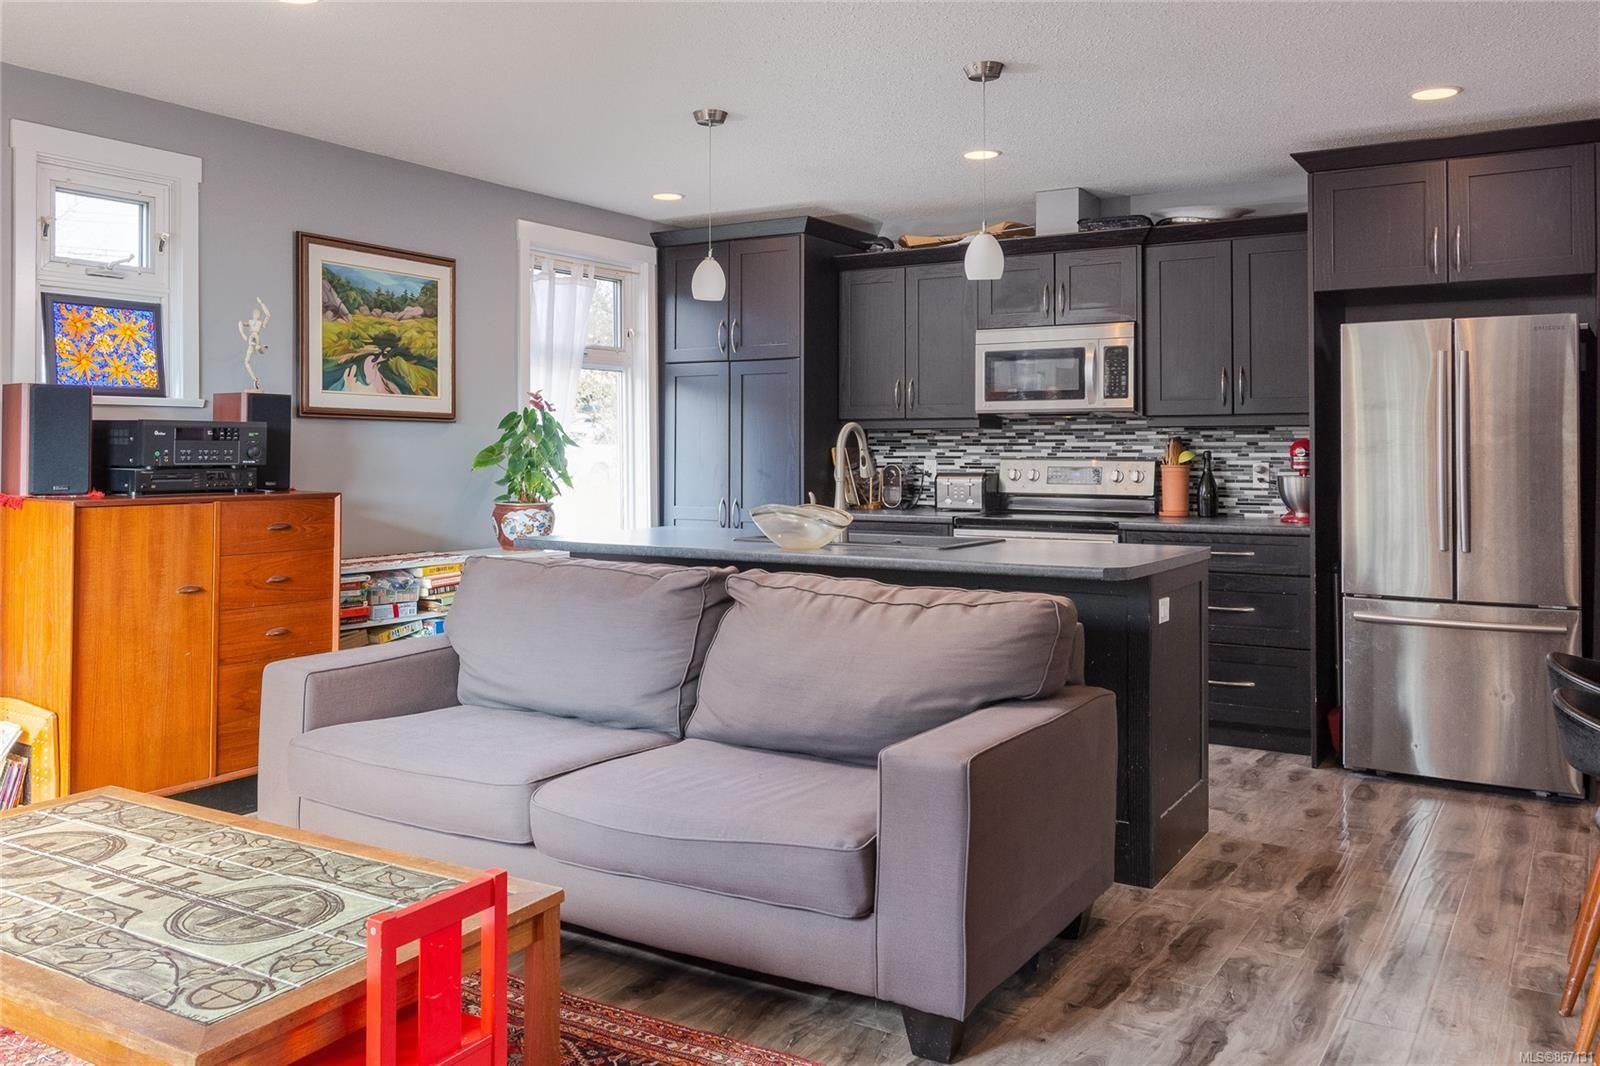 Main Photo: 590 Bradley St in : Na Central Nanaimo House for sale (Nanaimo)  : MLS®# 867131